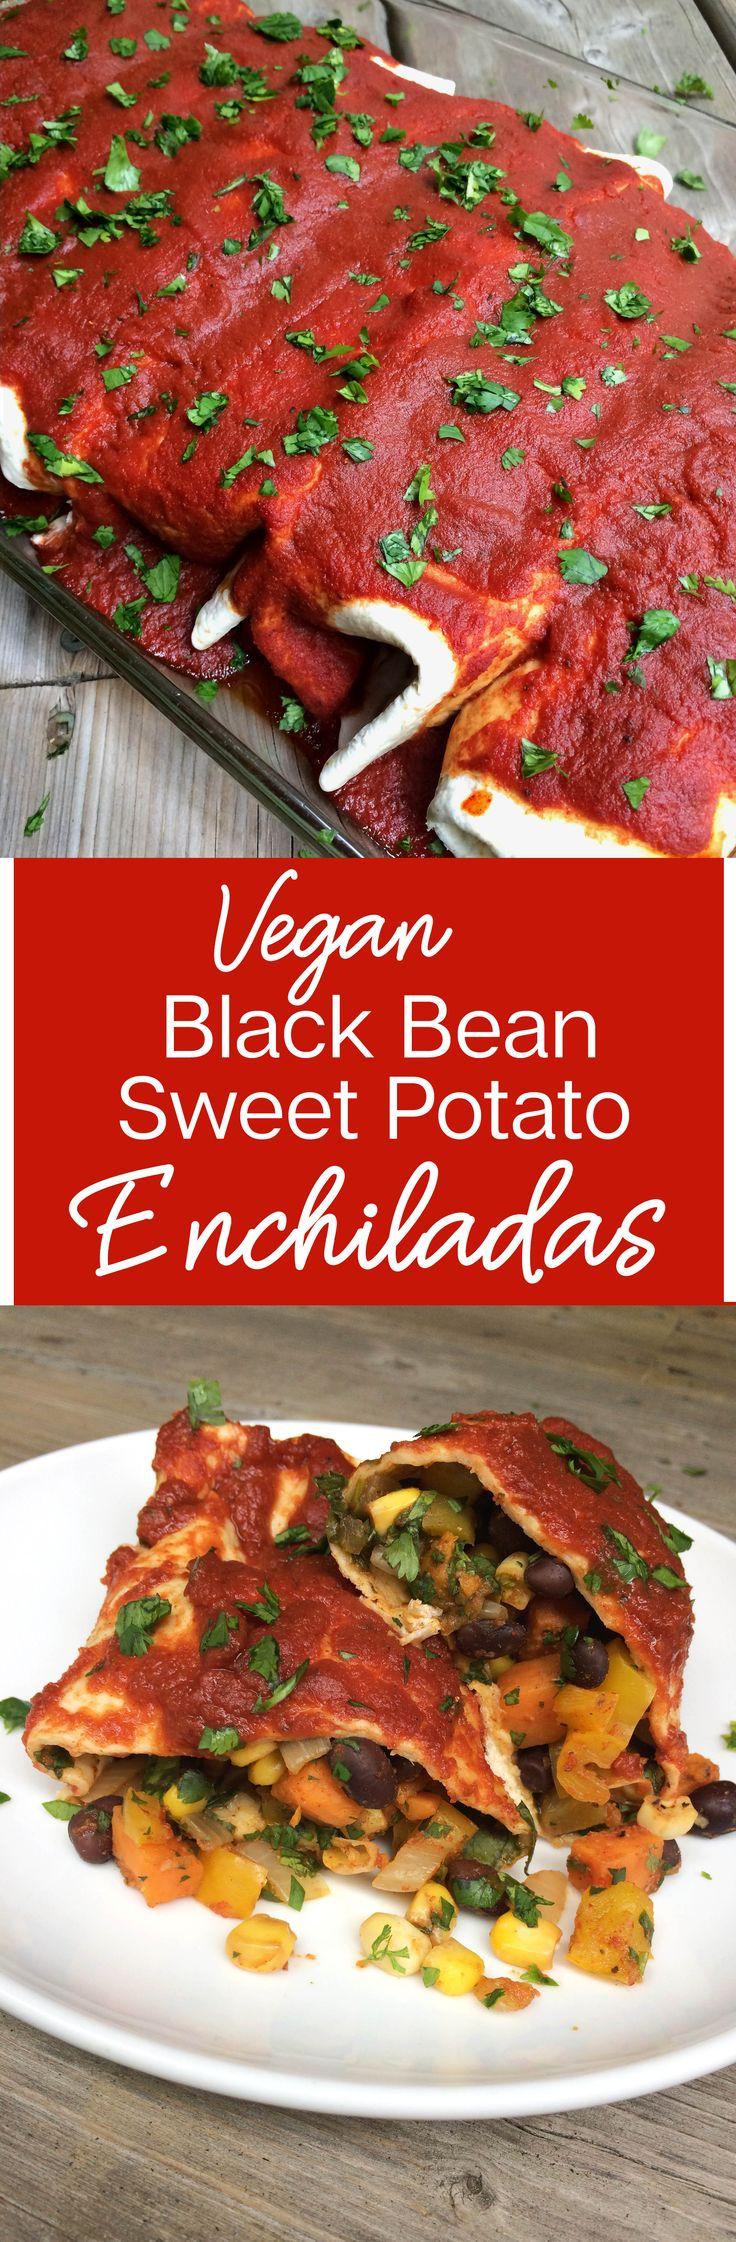 Vegan Sweet Potato Black Bean Enchiladas Recipe